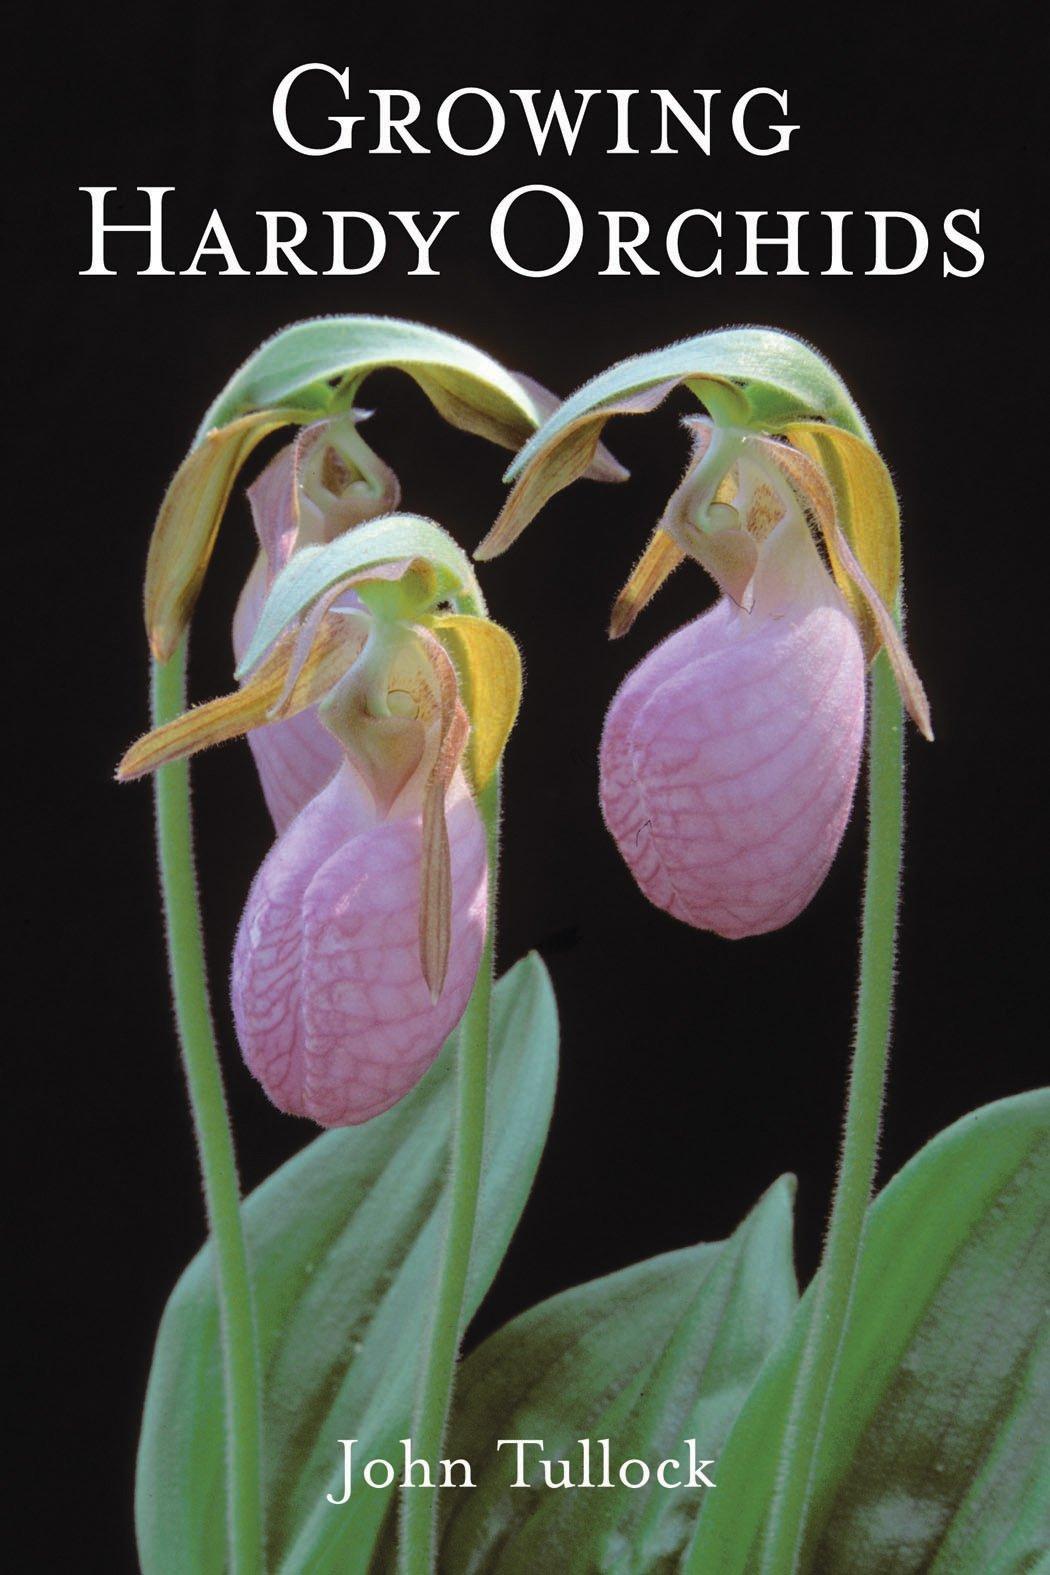 Growing Hardy Orchids Tullock John 9780881927153 Amazon Com Books